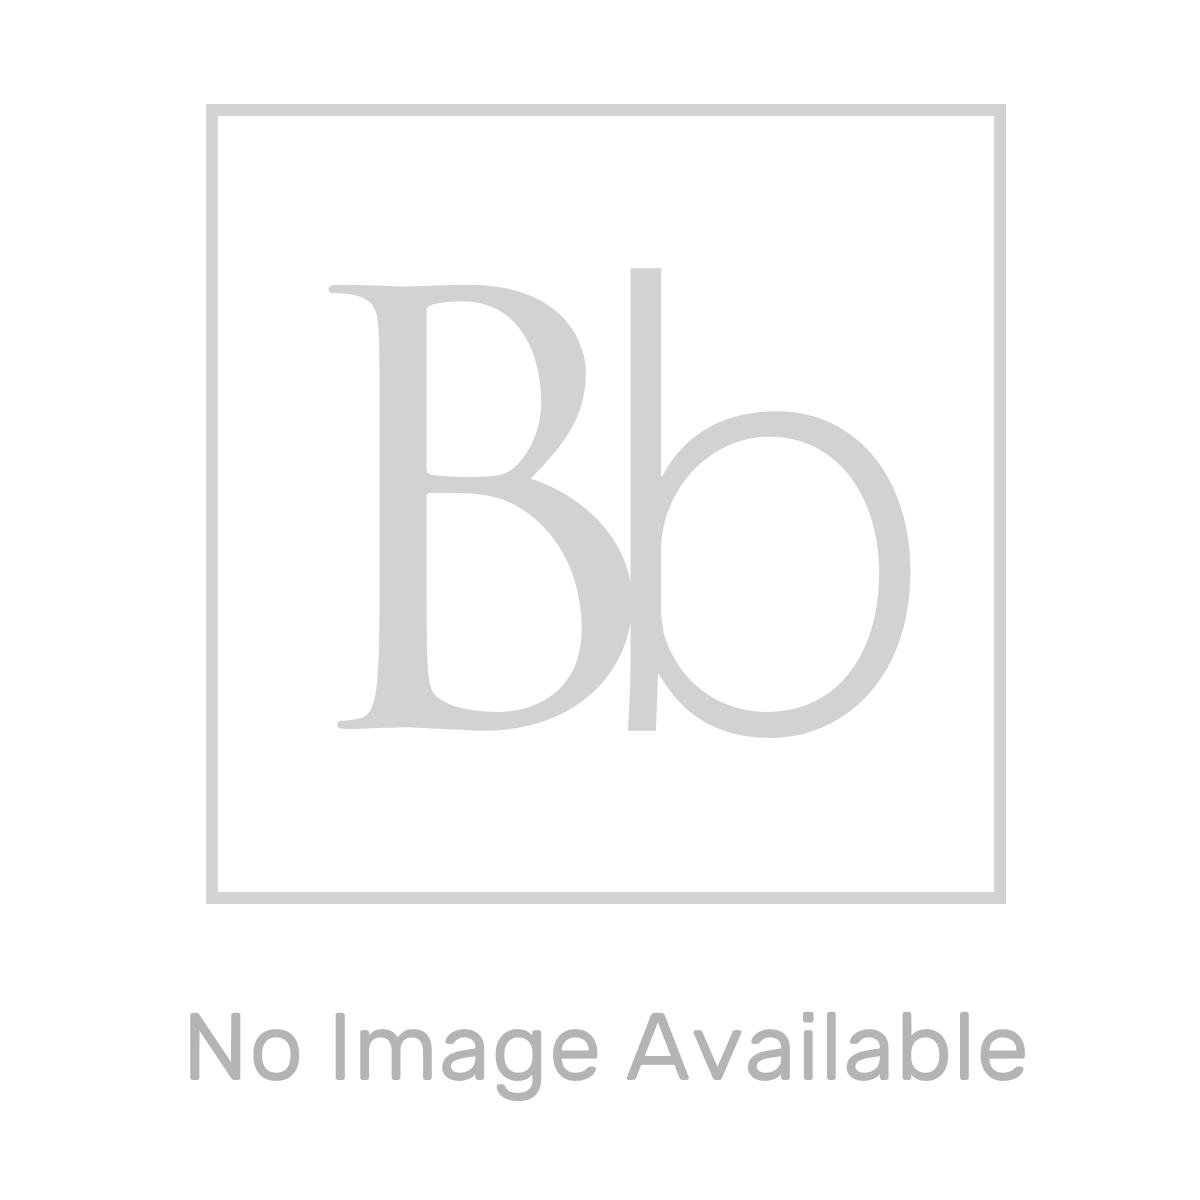 RAK Surface Matt Clay Tile 300 x 600mm Lifestyle